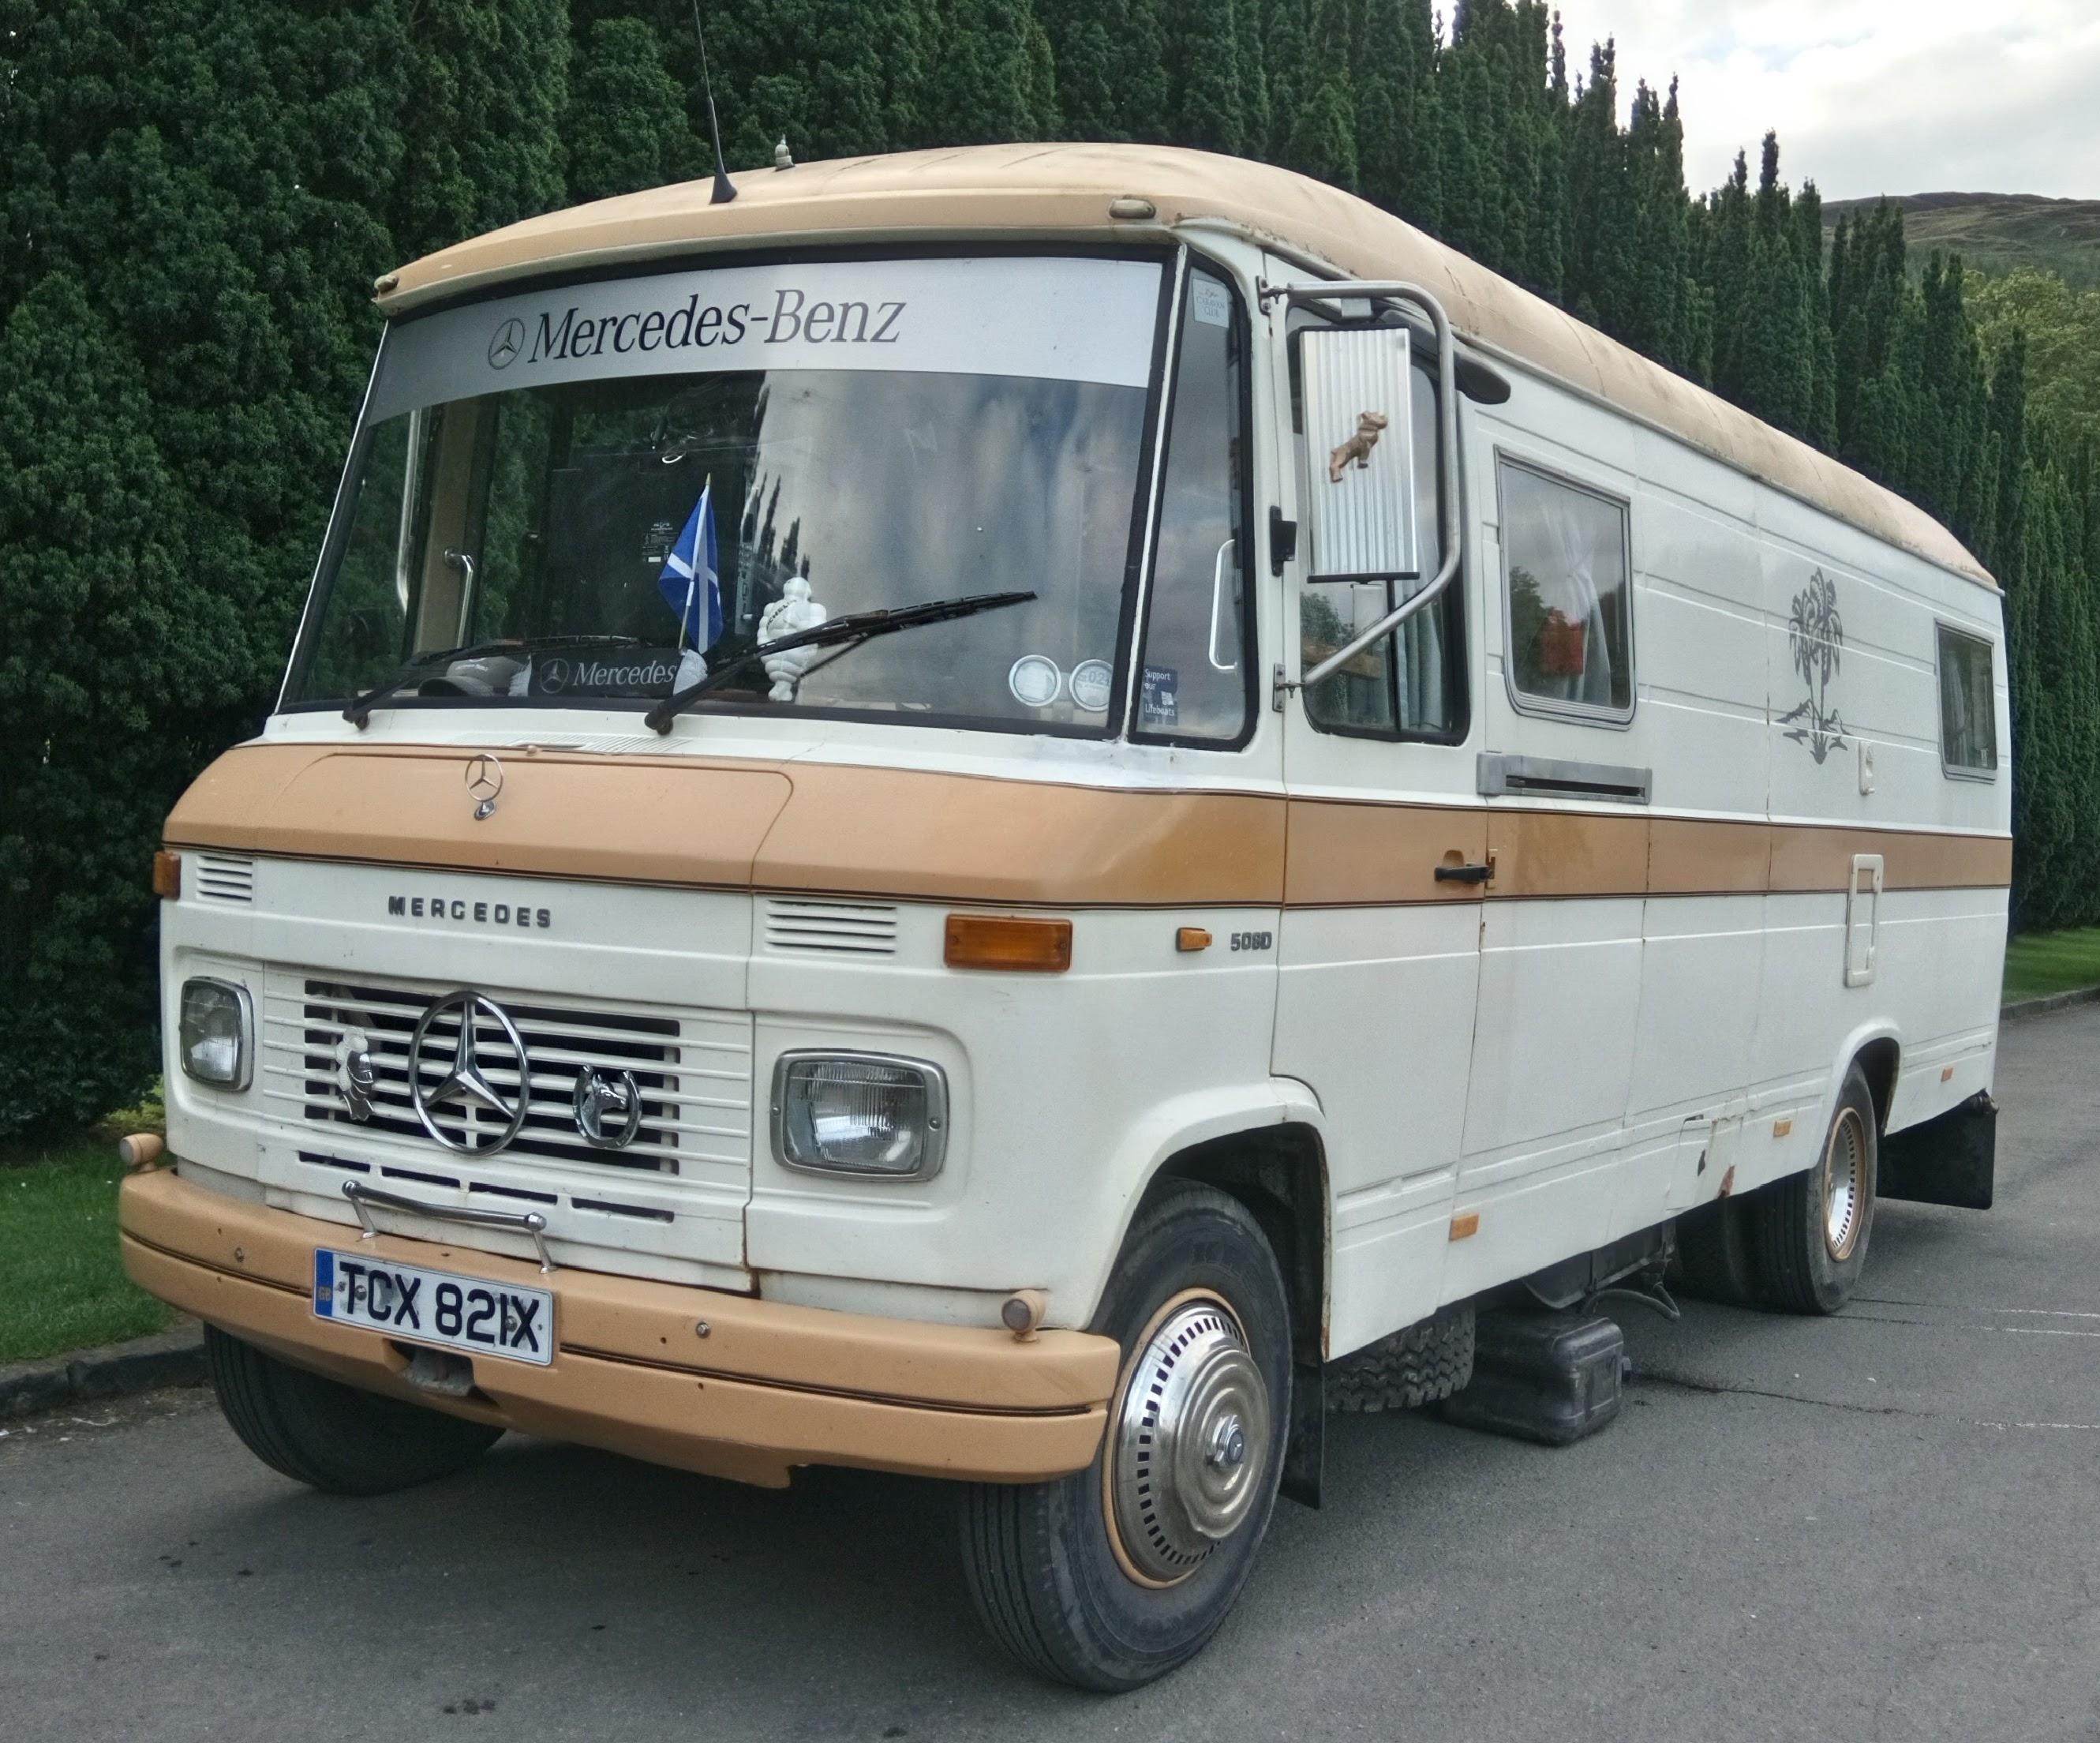 File:Mercedes Benz T10 Campervan 10.jpg - Wikimedia Commons